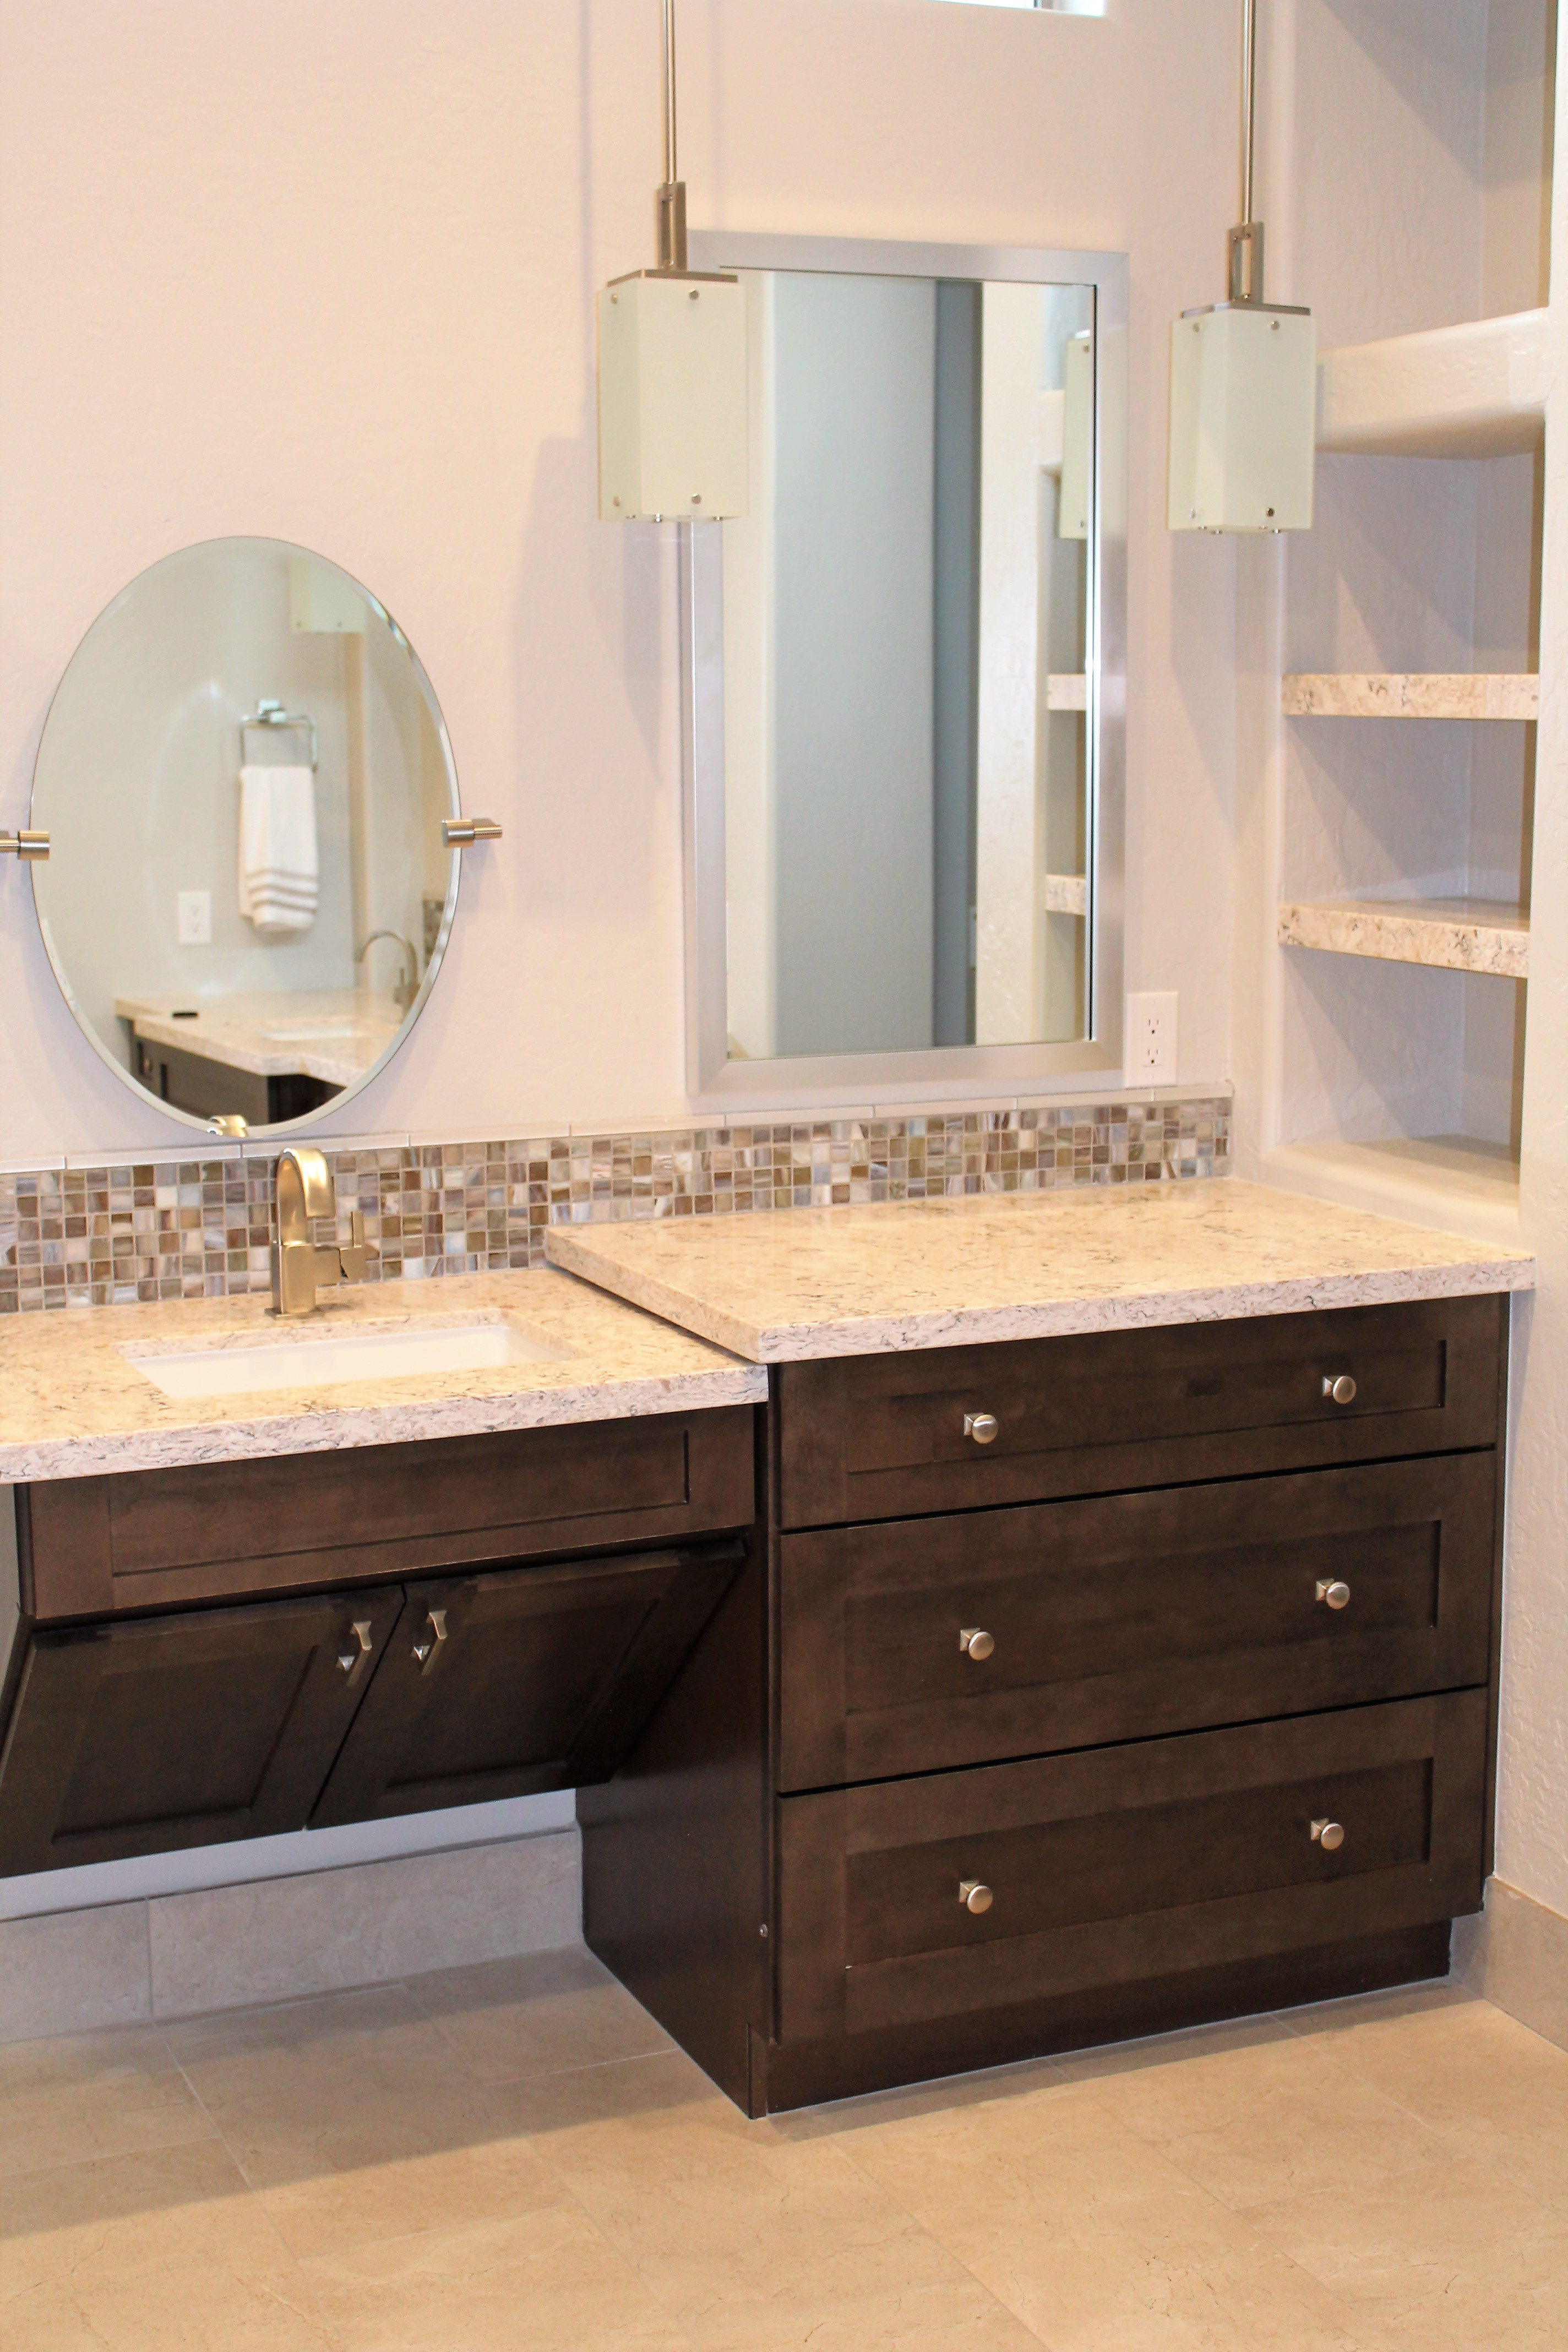 Top Home Improvement Tips for Living with Alzheimer's-Universal Design - Interior Design Scottsdale, AZ by S Interior Design